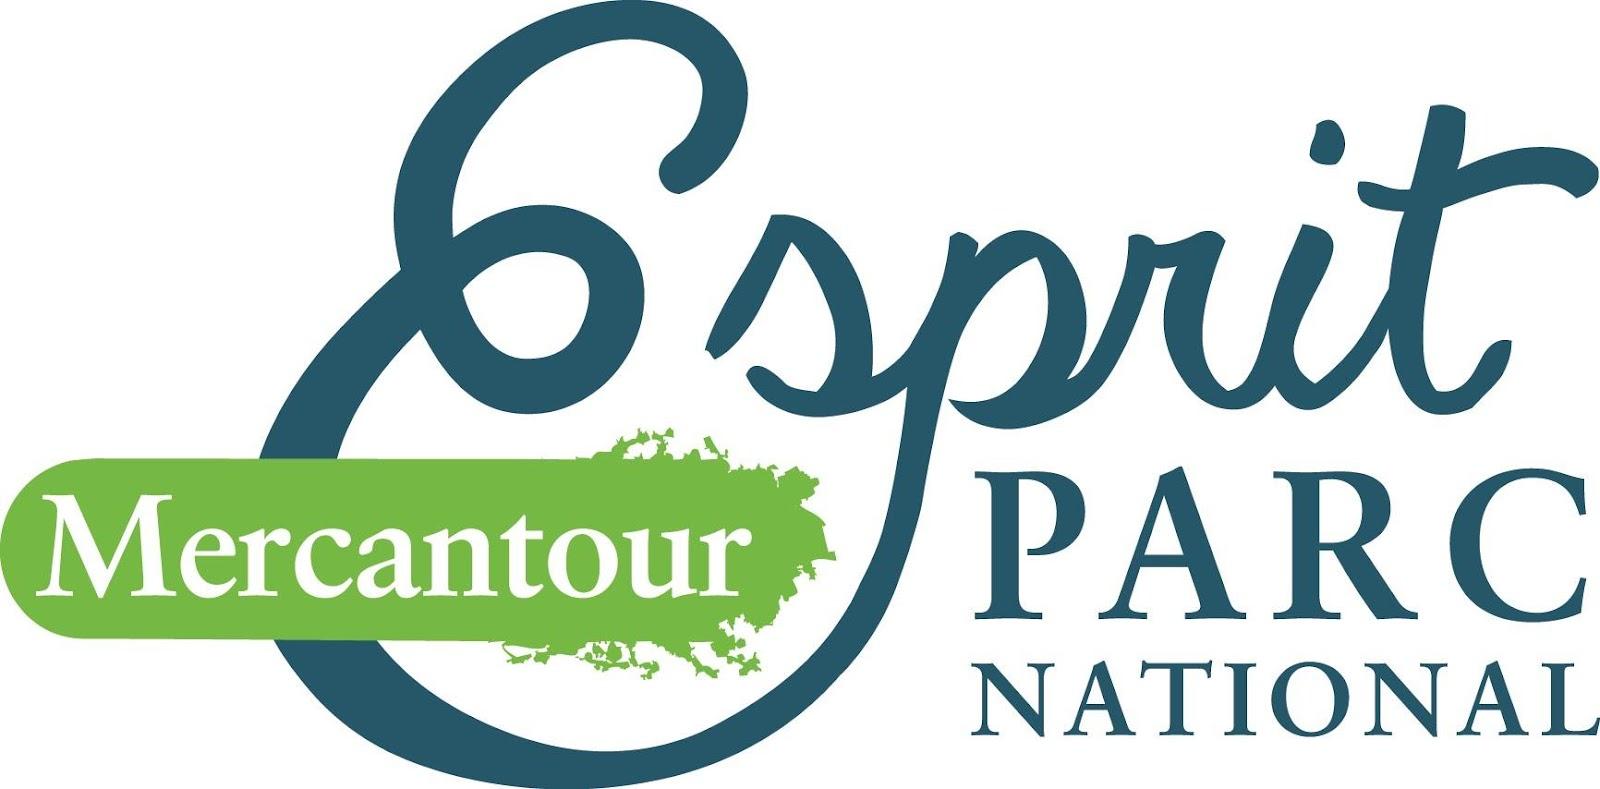 \Users\Marie Mayer\Desktop\PROMO 2017\Marque Esprit Parc National\14211_Esprit_Parc-national_Mercantour_HD.jpg